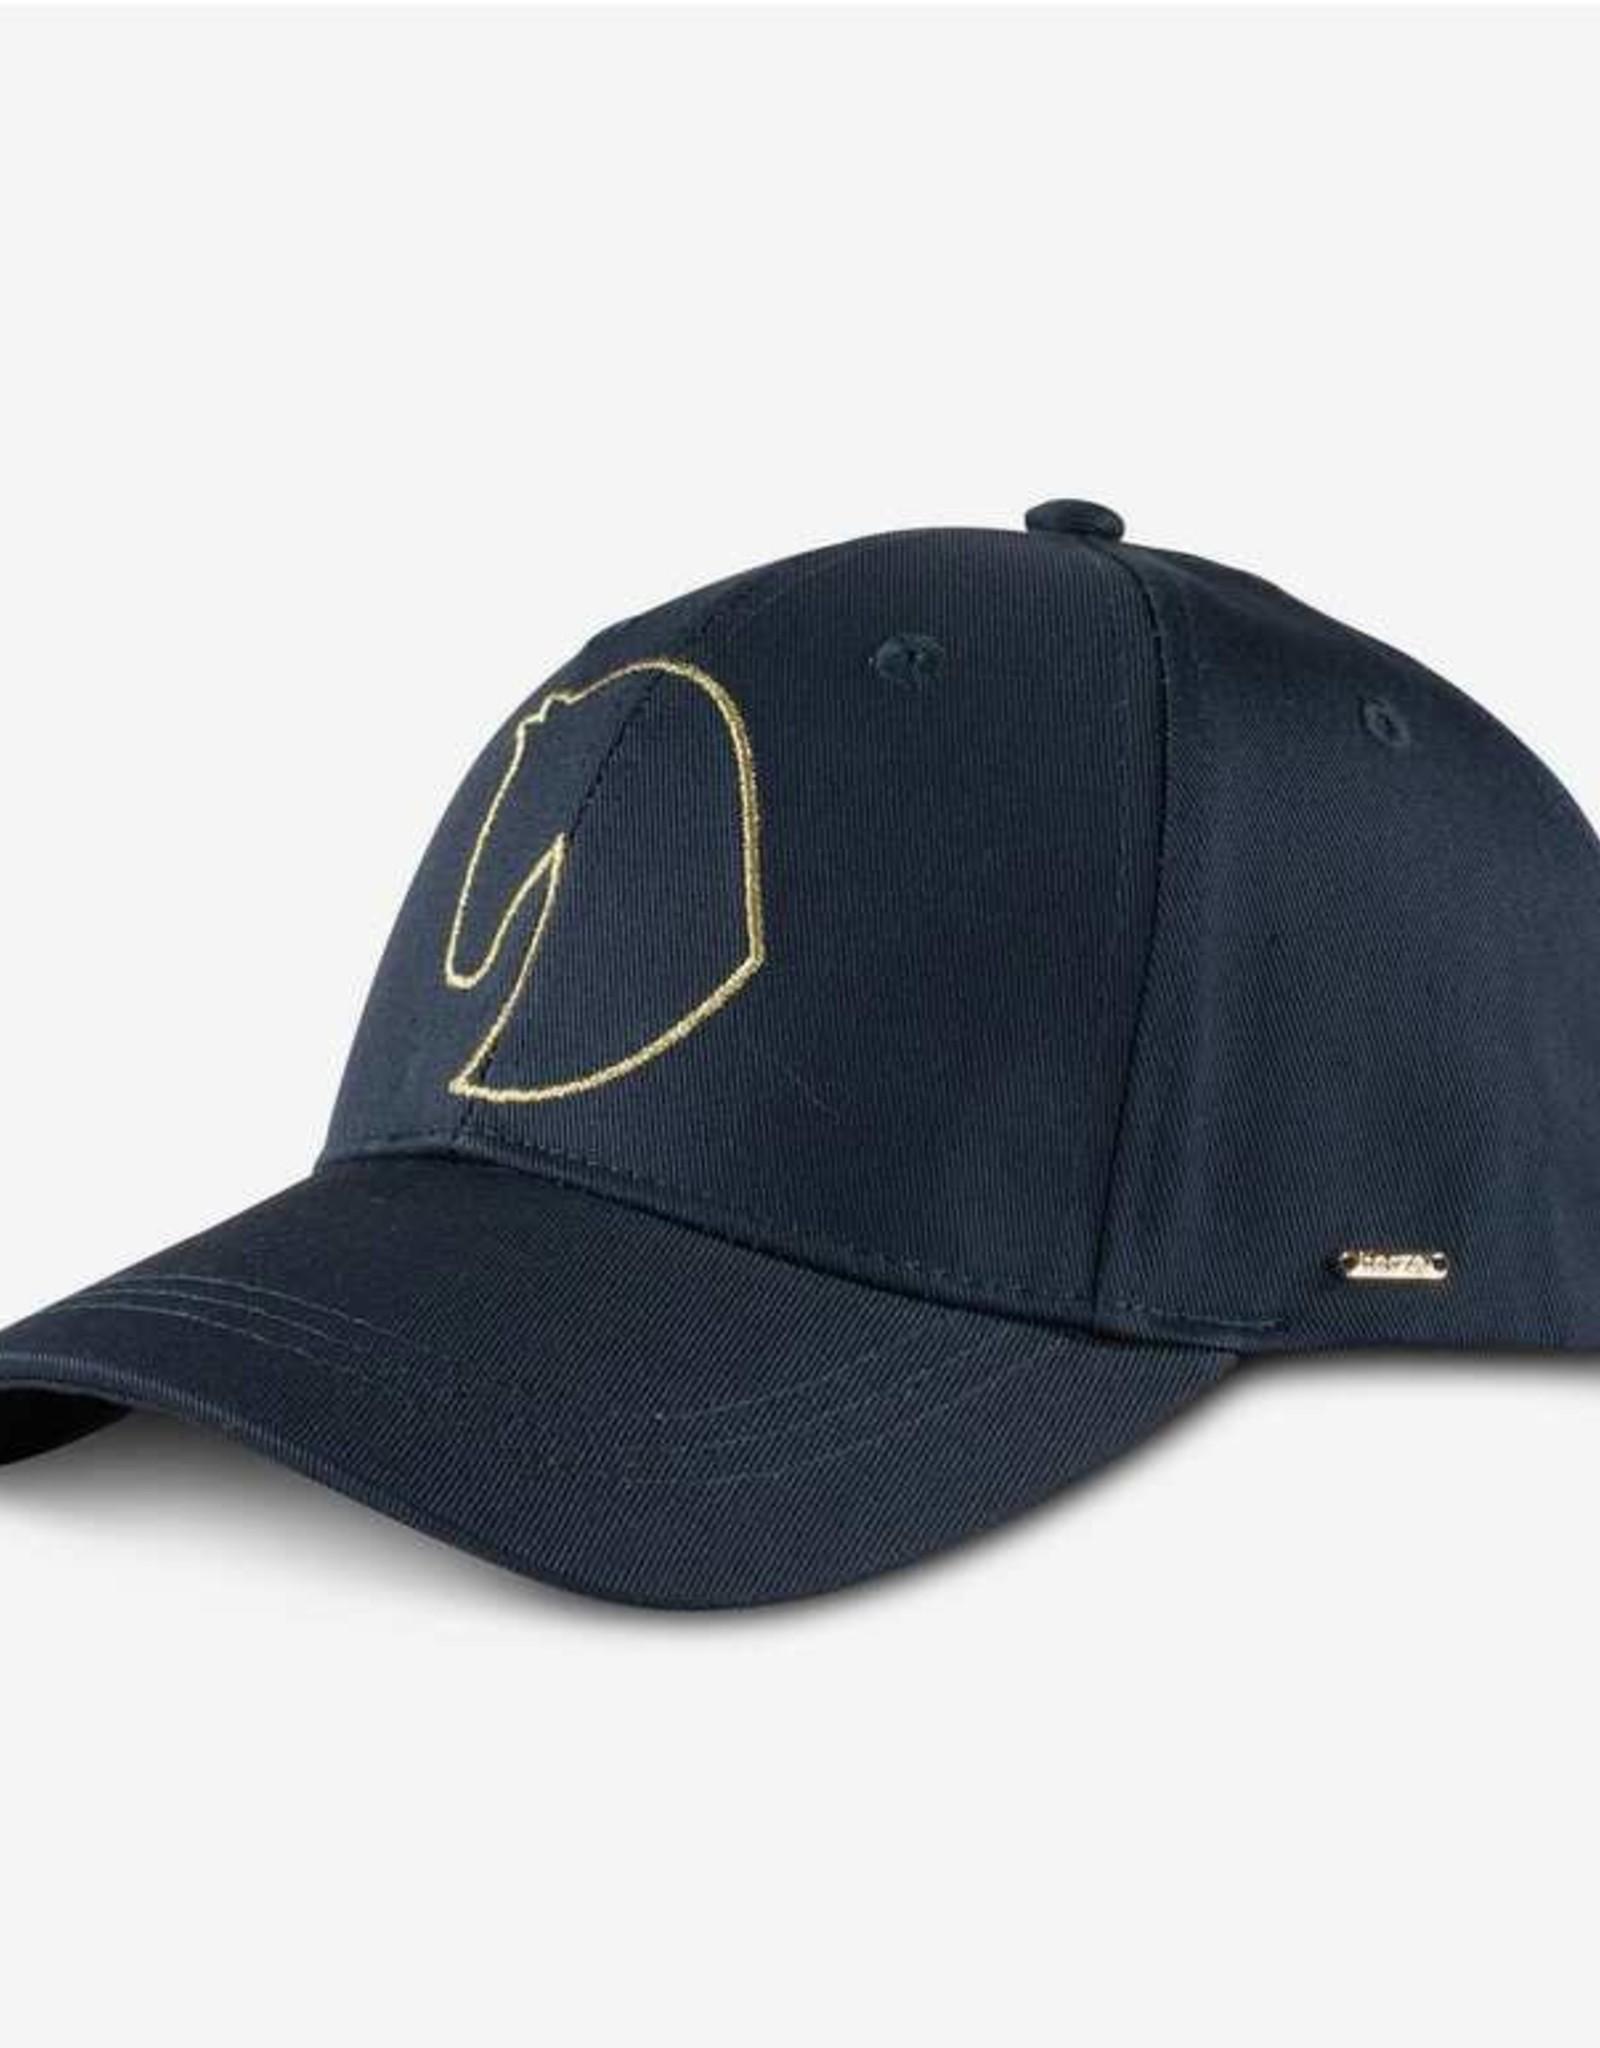 HORZE GOLD DETAIL HAT